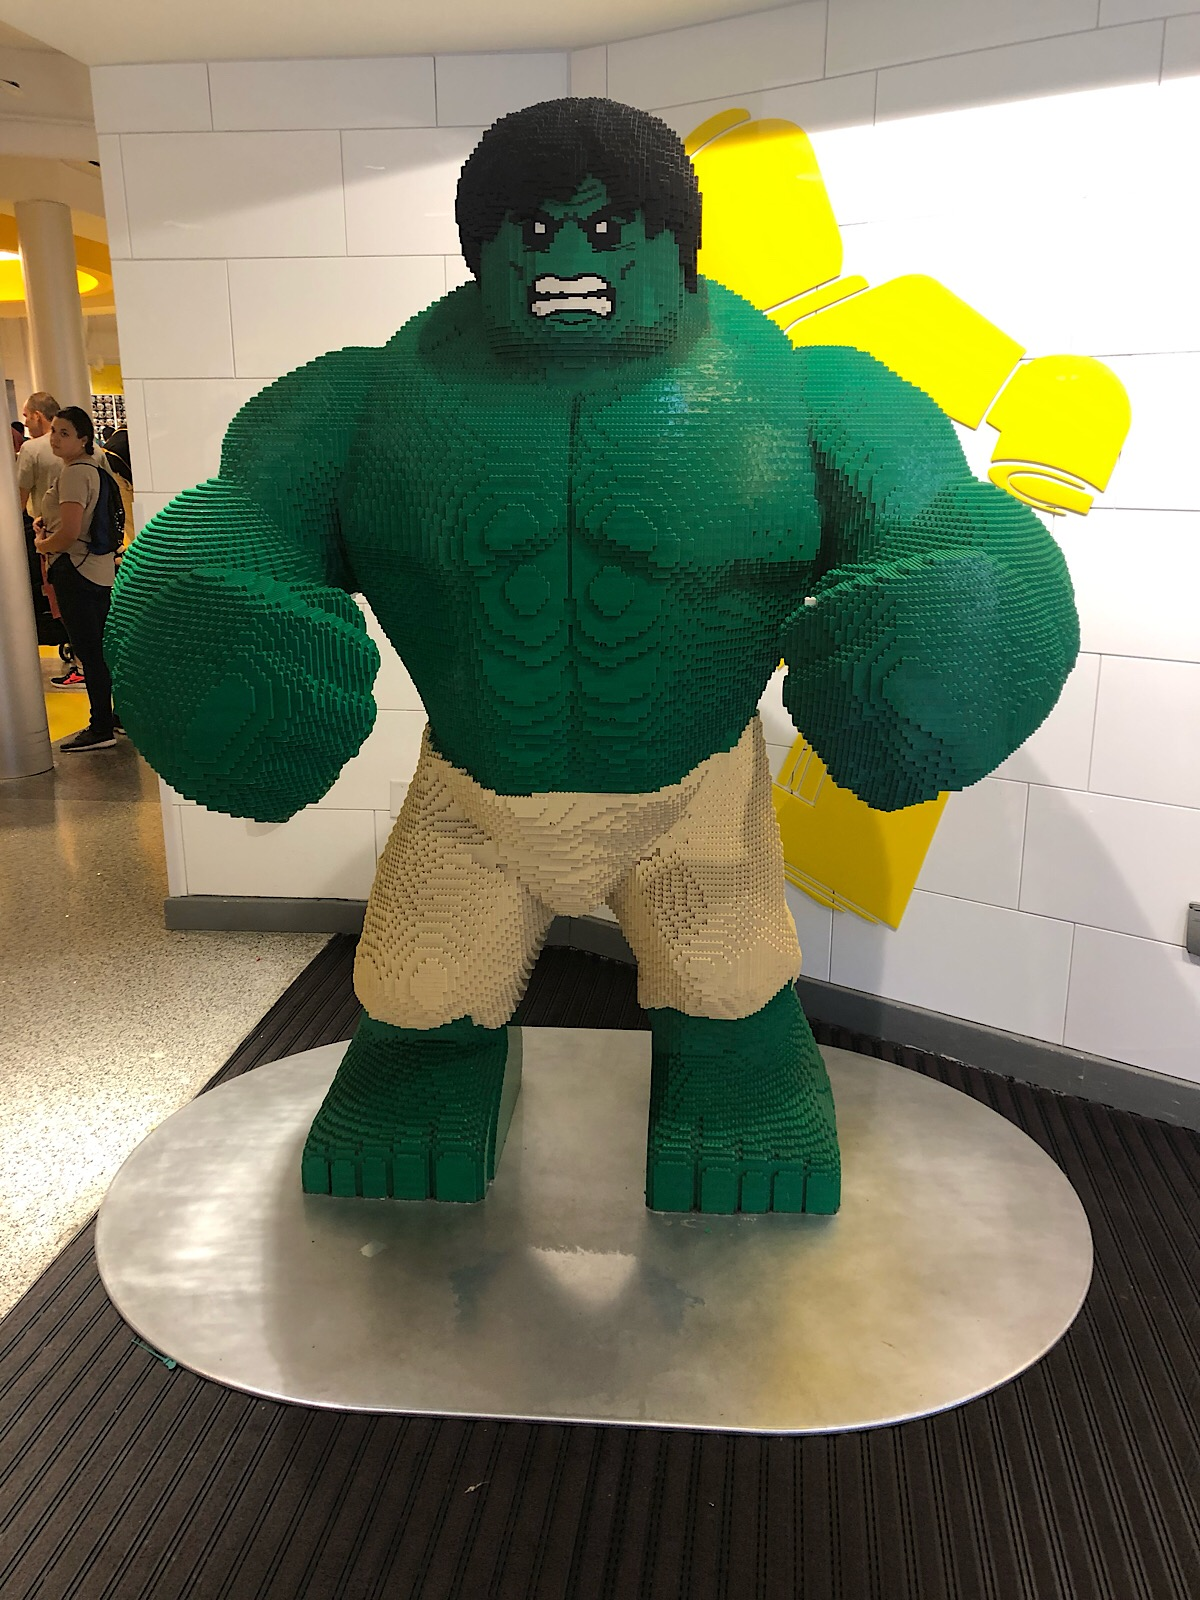 Huge LEGO Hulk figure model at Disney Springs, Florida